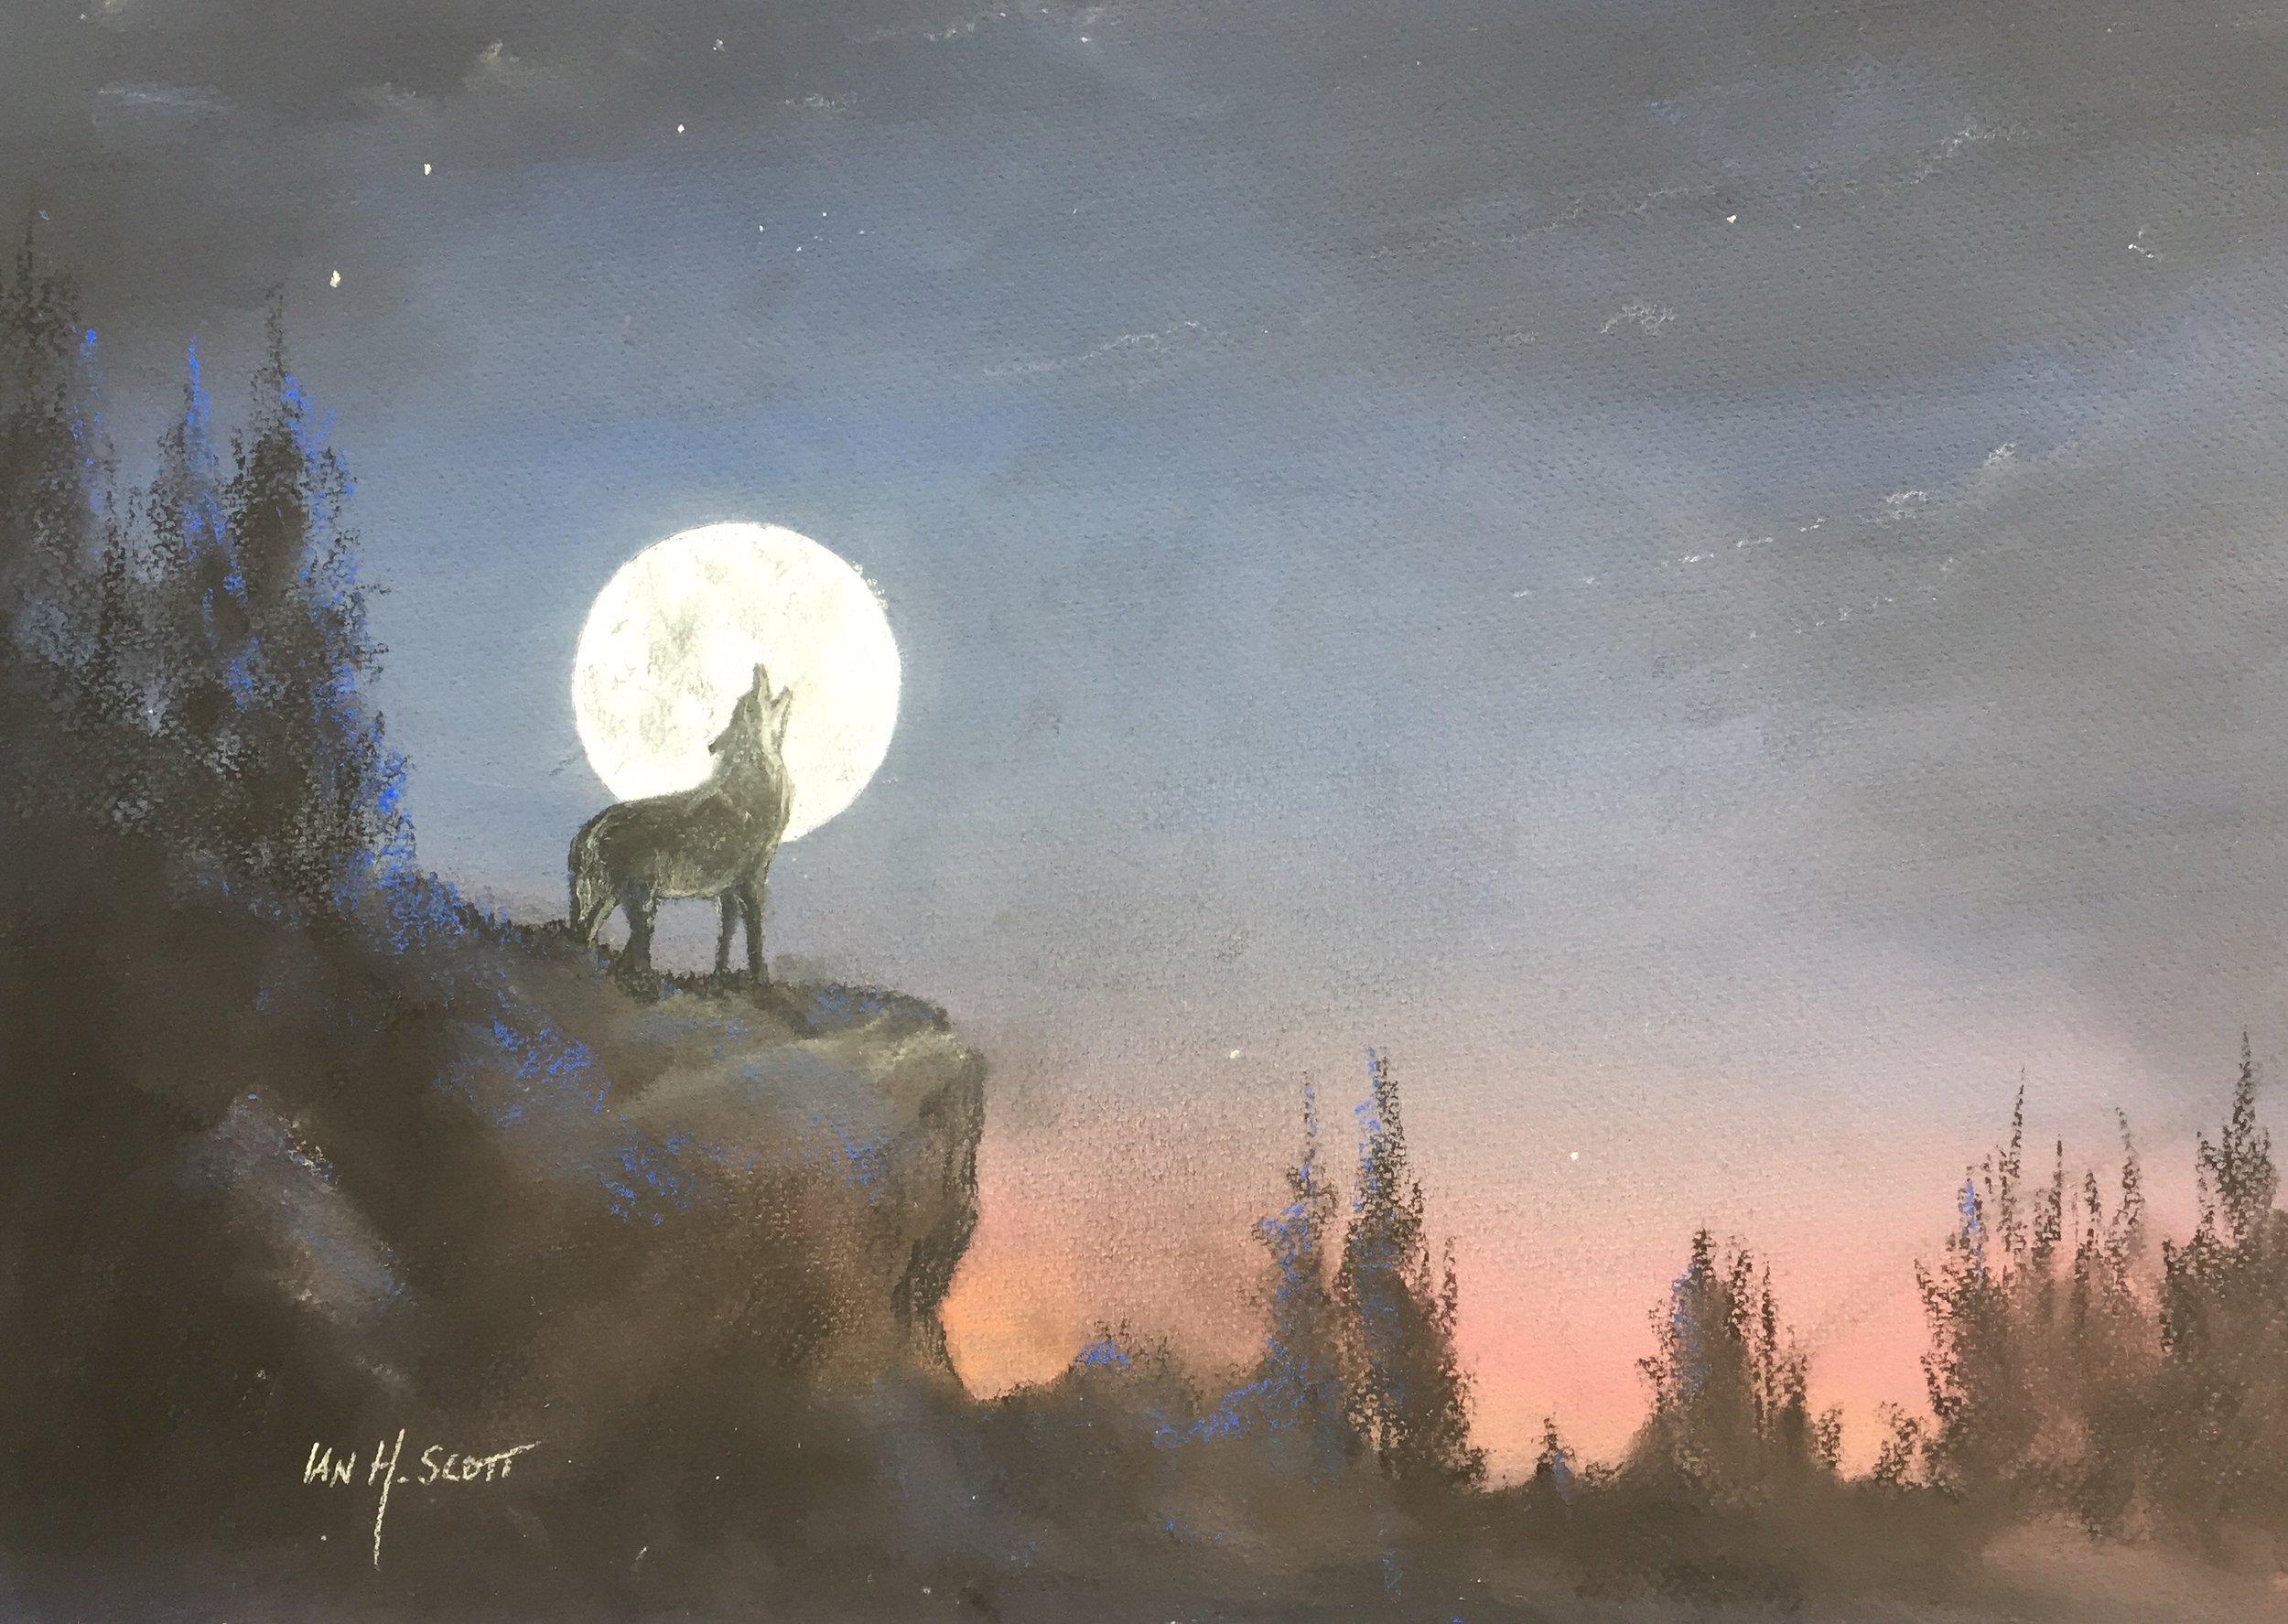 Ian Scott wolf.jpg